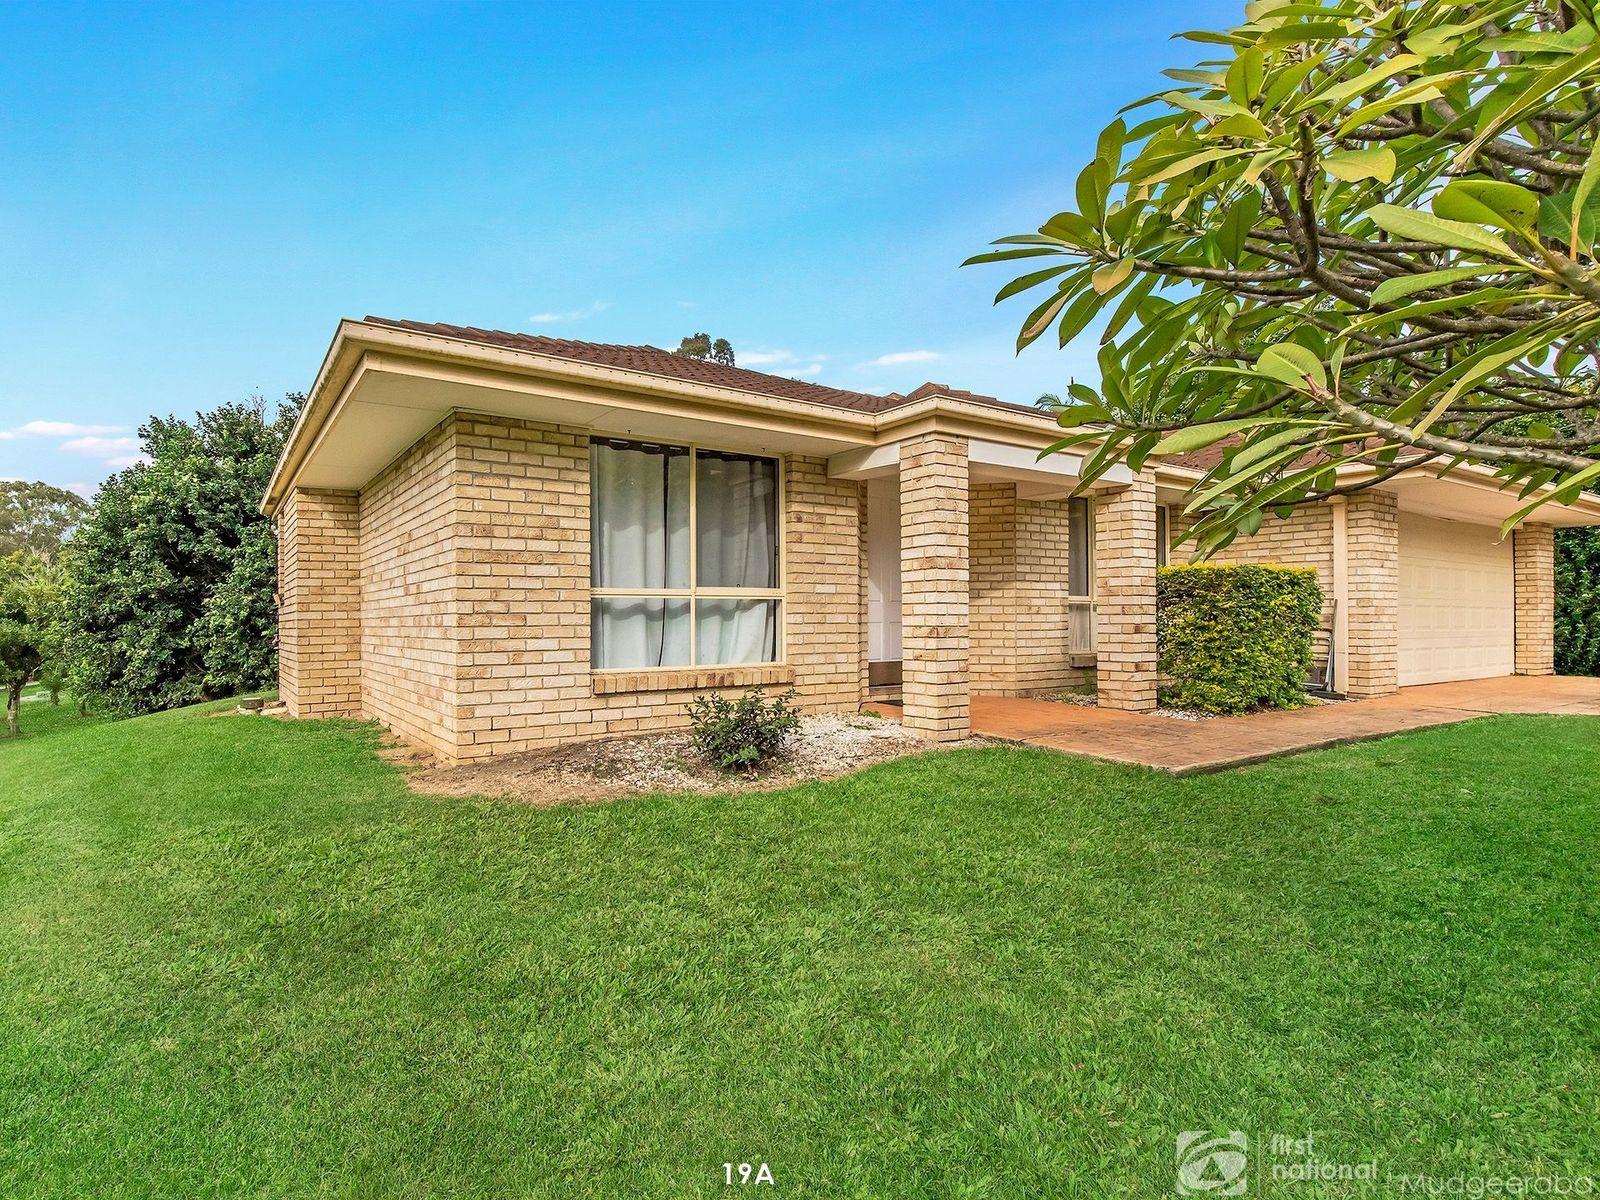 19 Rayner Lane, Mudgeeraba, QLD 4213